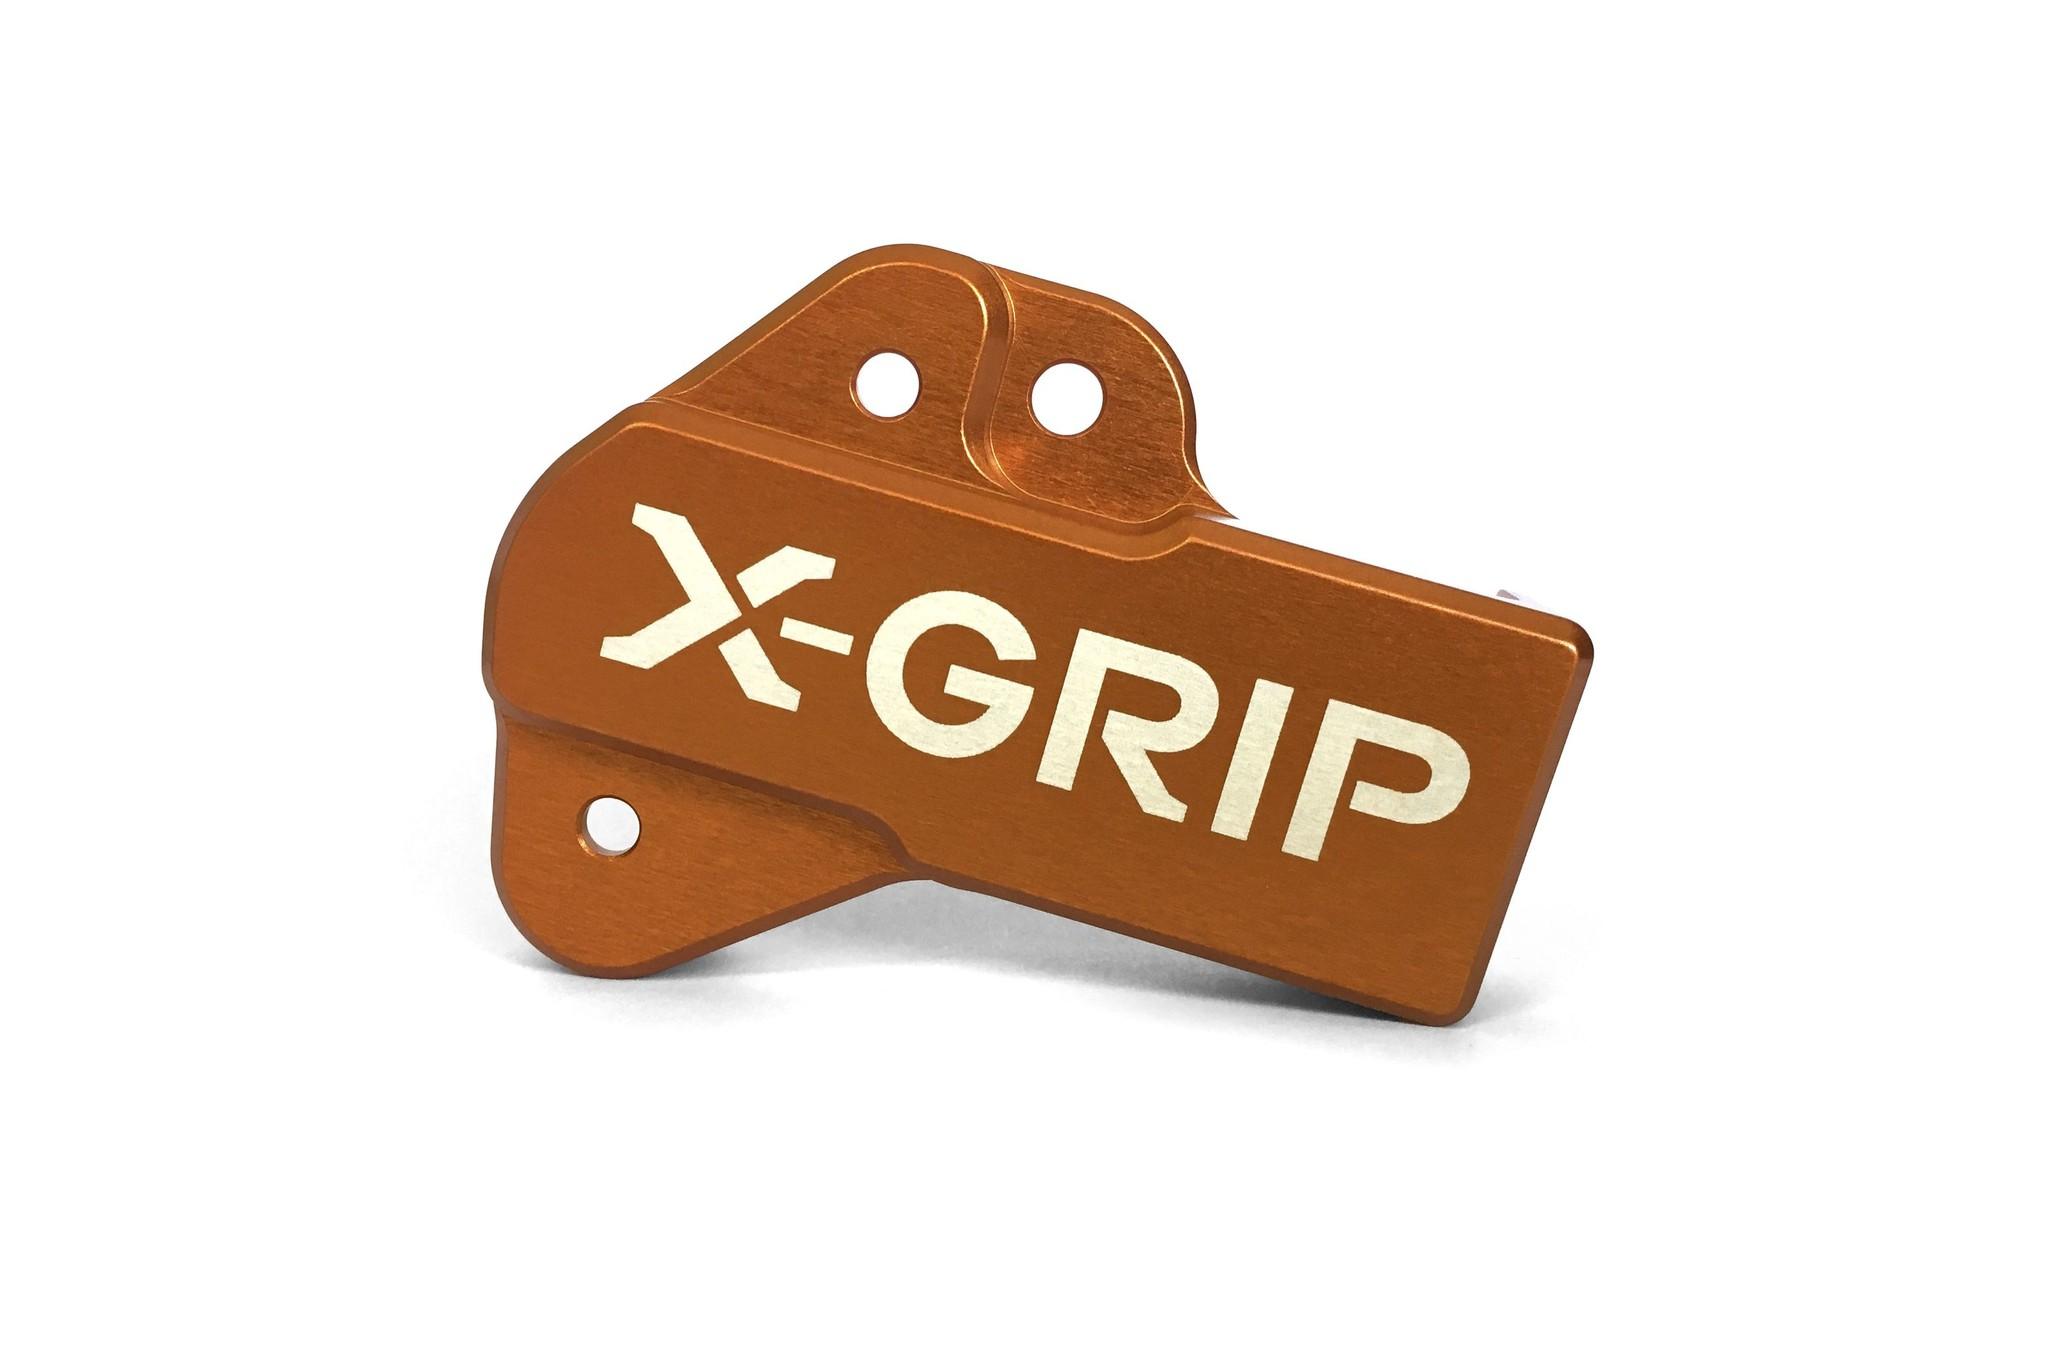 X-GRIP Drosselklappen -Sensor -Schutz TPI / TEi